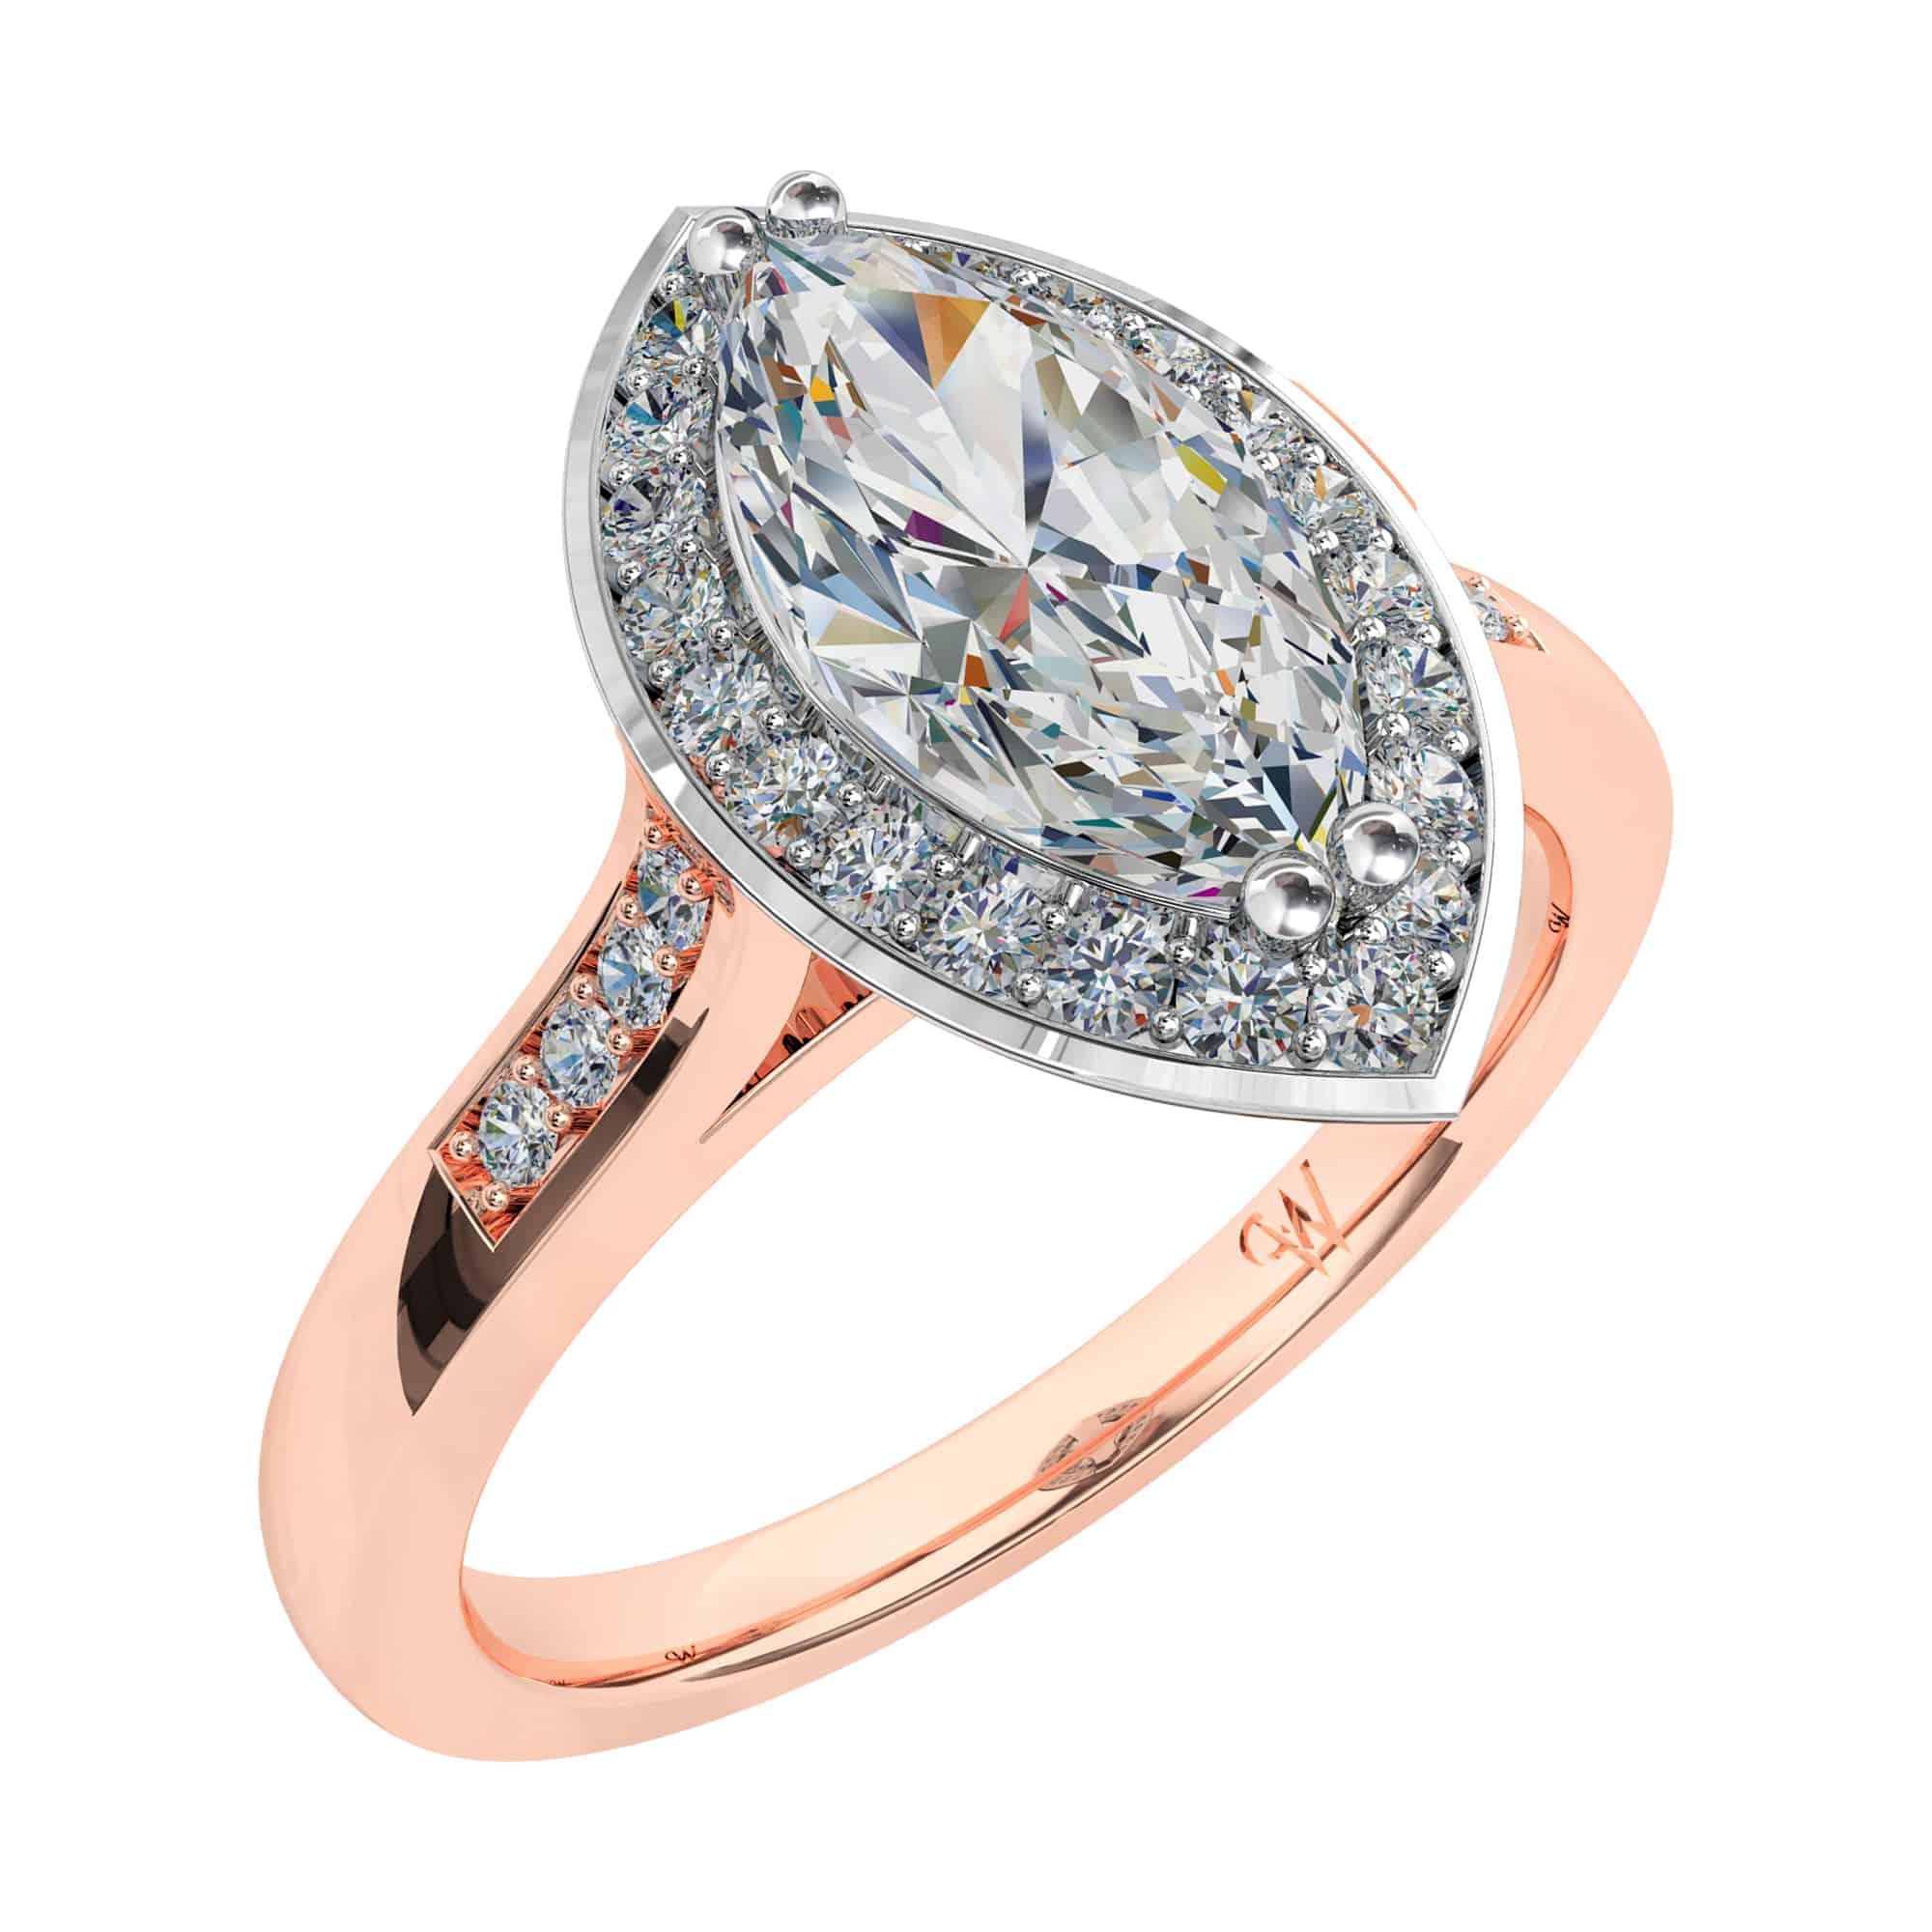 Marquise Cut Diamond Halo Engagement Ring